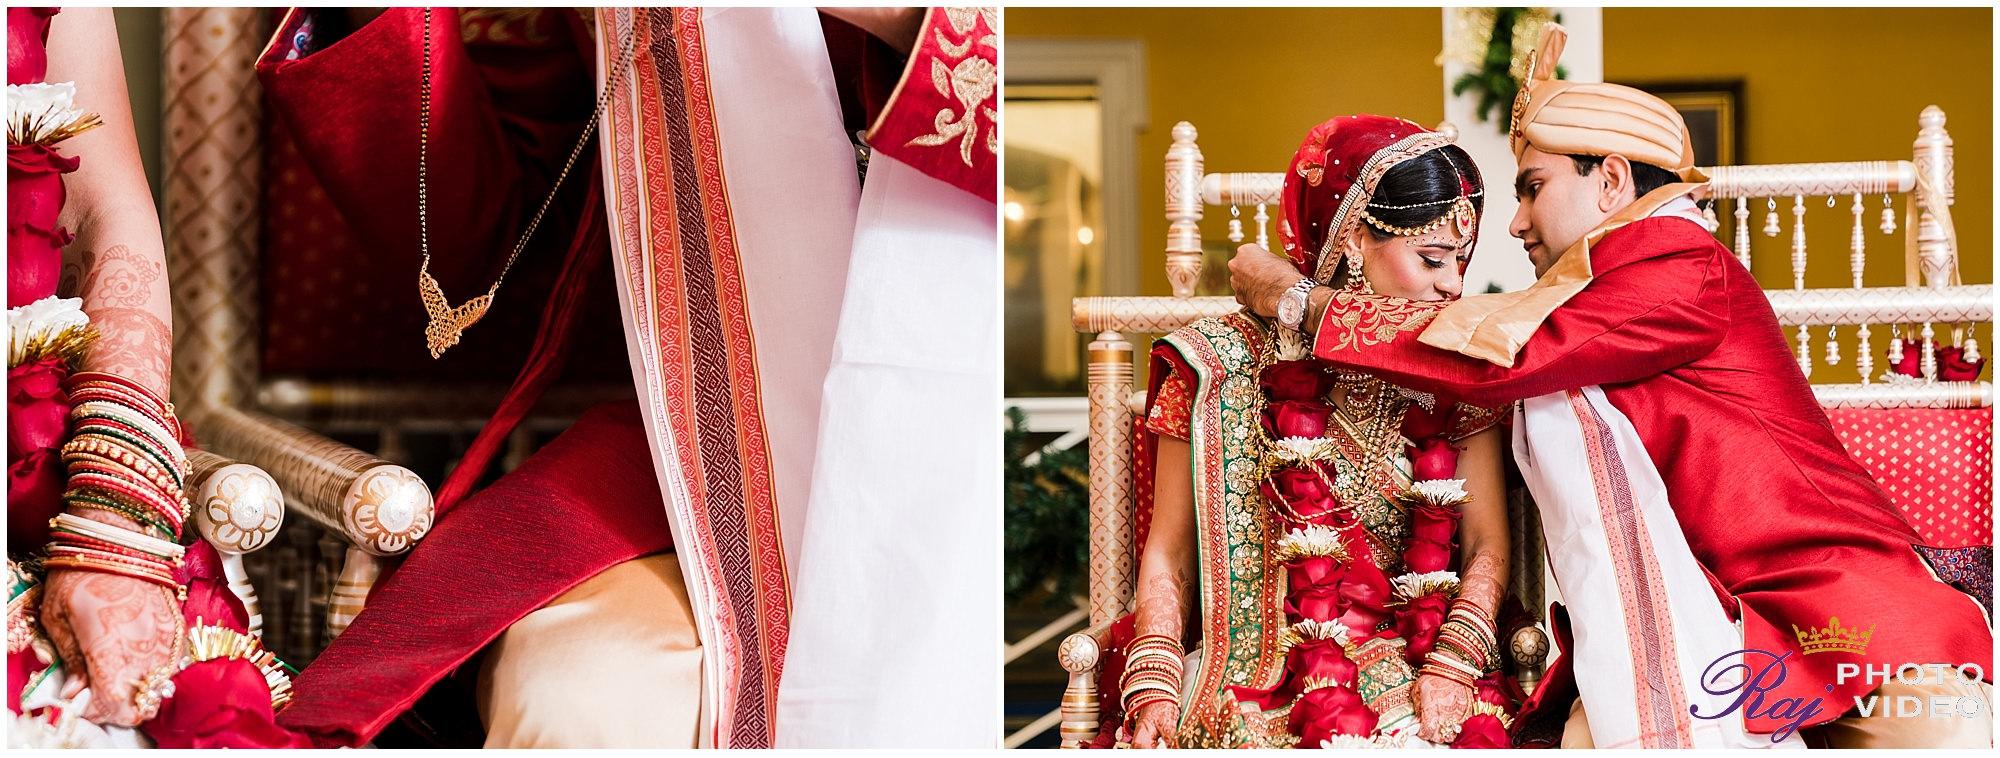 Founders-Inn-and-Spa-Virginia-Beach-VA-Indian-Wedding-Harini-Vivek-56.jpg